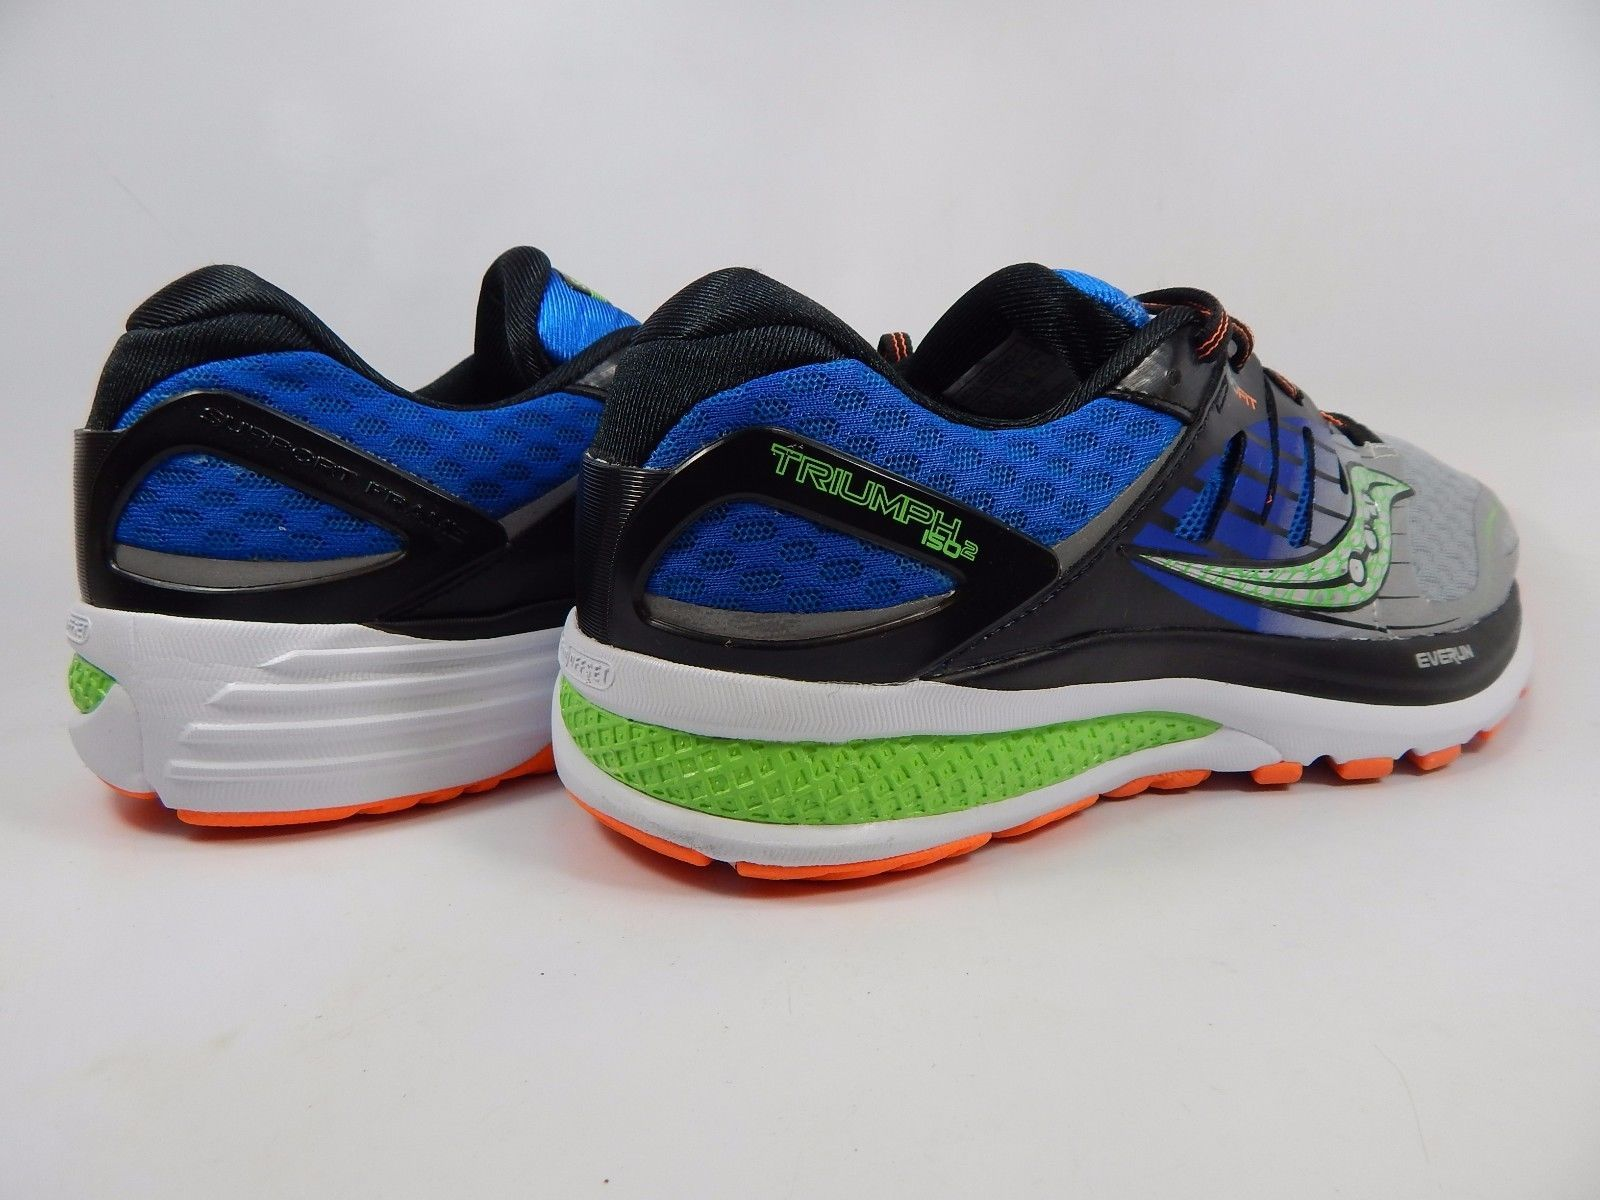 Saucony Hurricane ISO 2 Men's Running Shoes Sz US 10 M (D) EU 44 Silver S20290-1